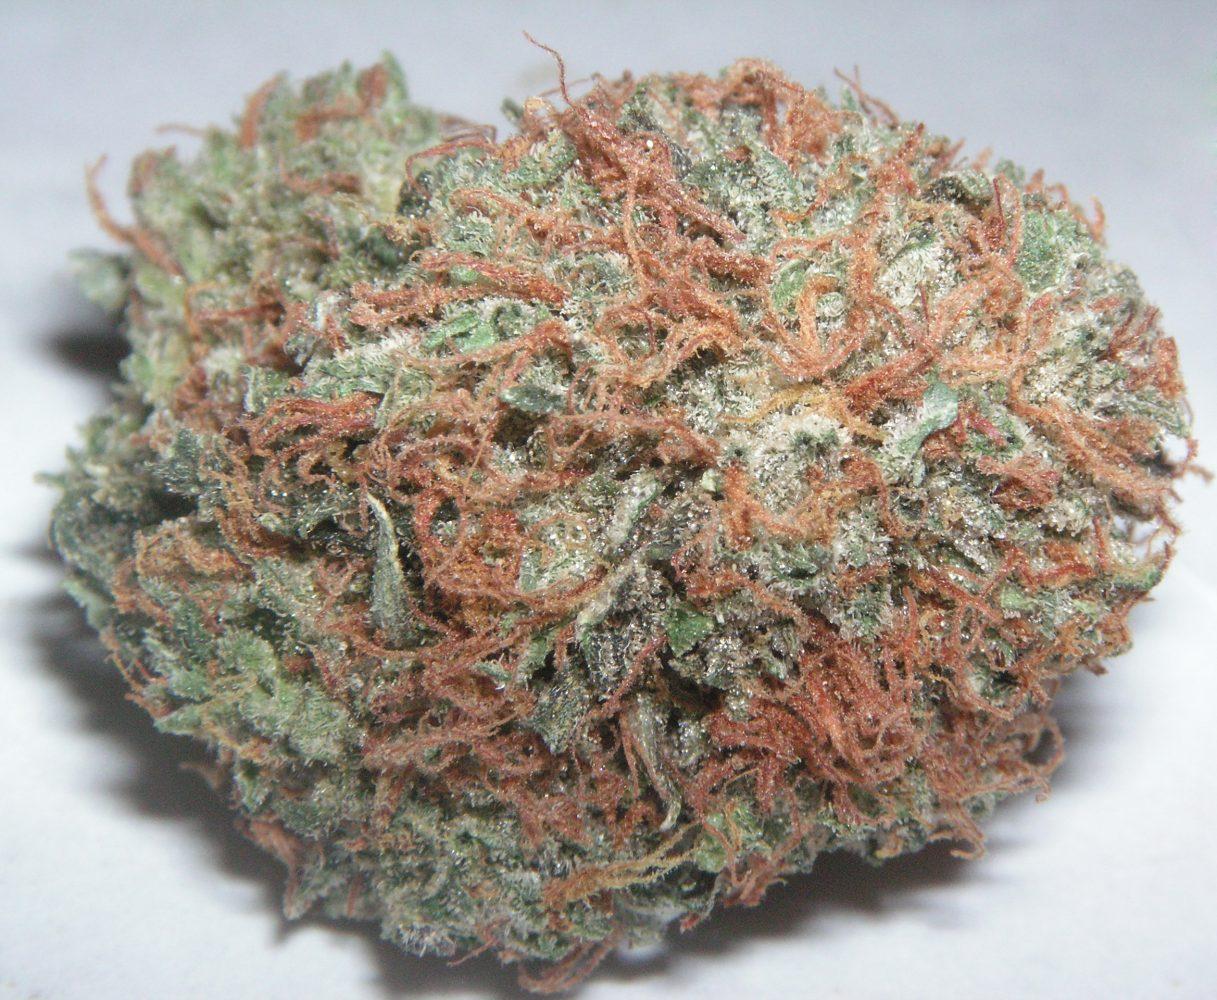 Marijuana+Law+Change+